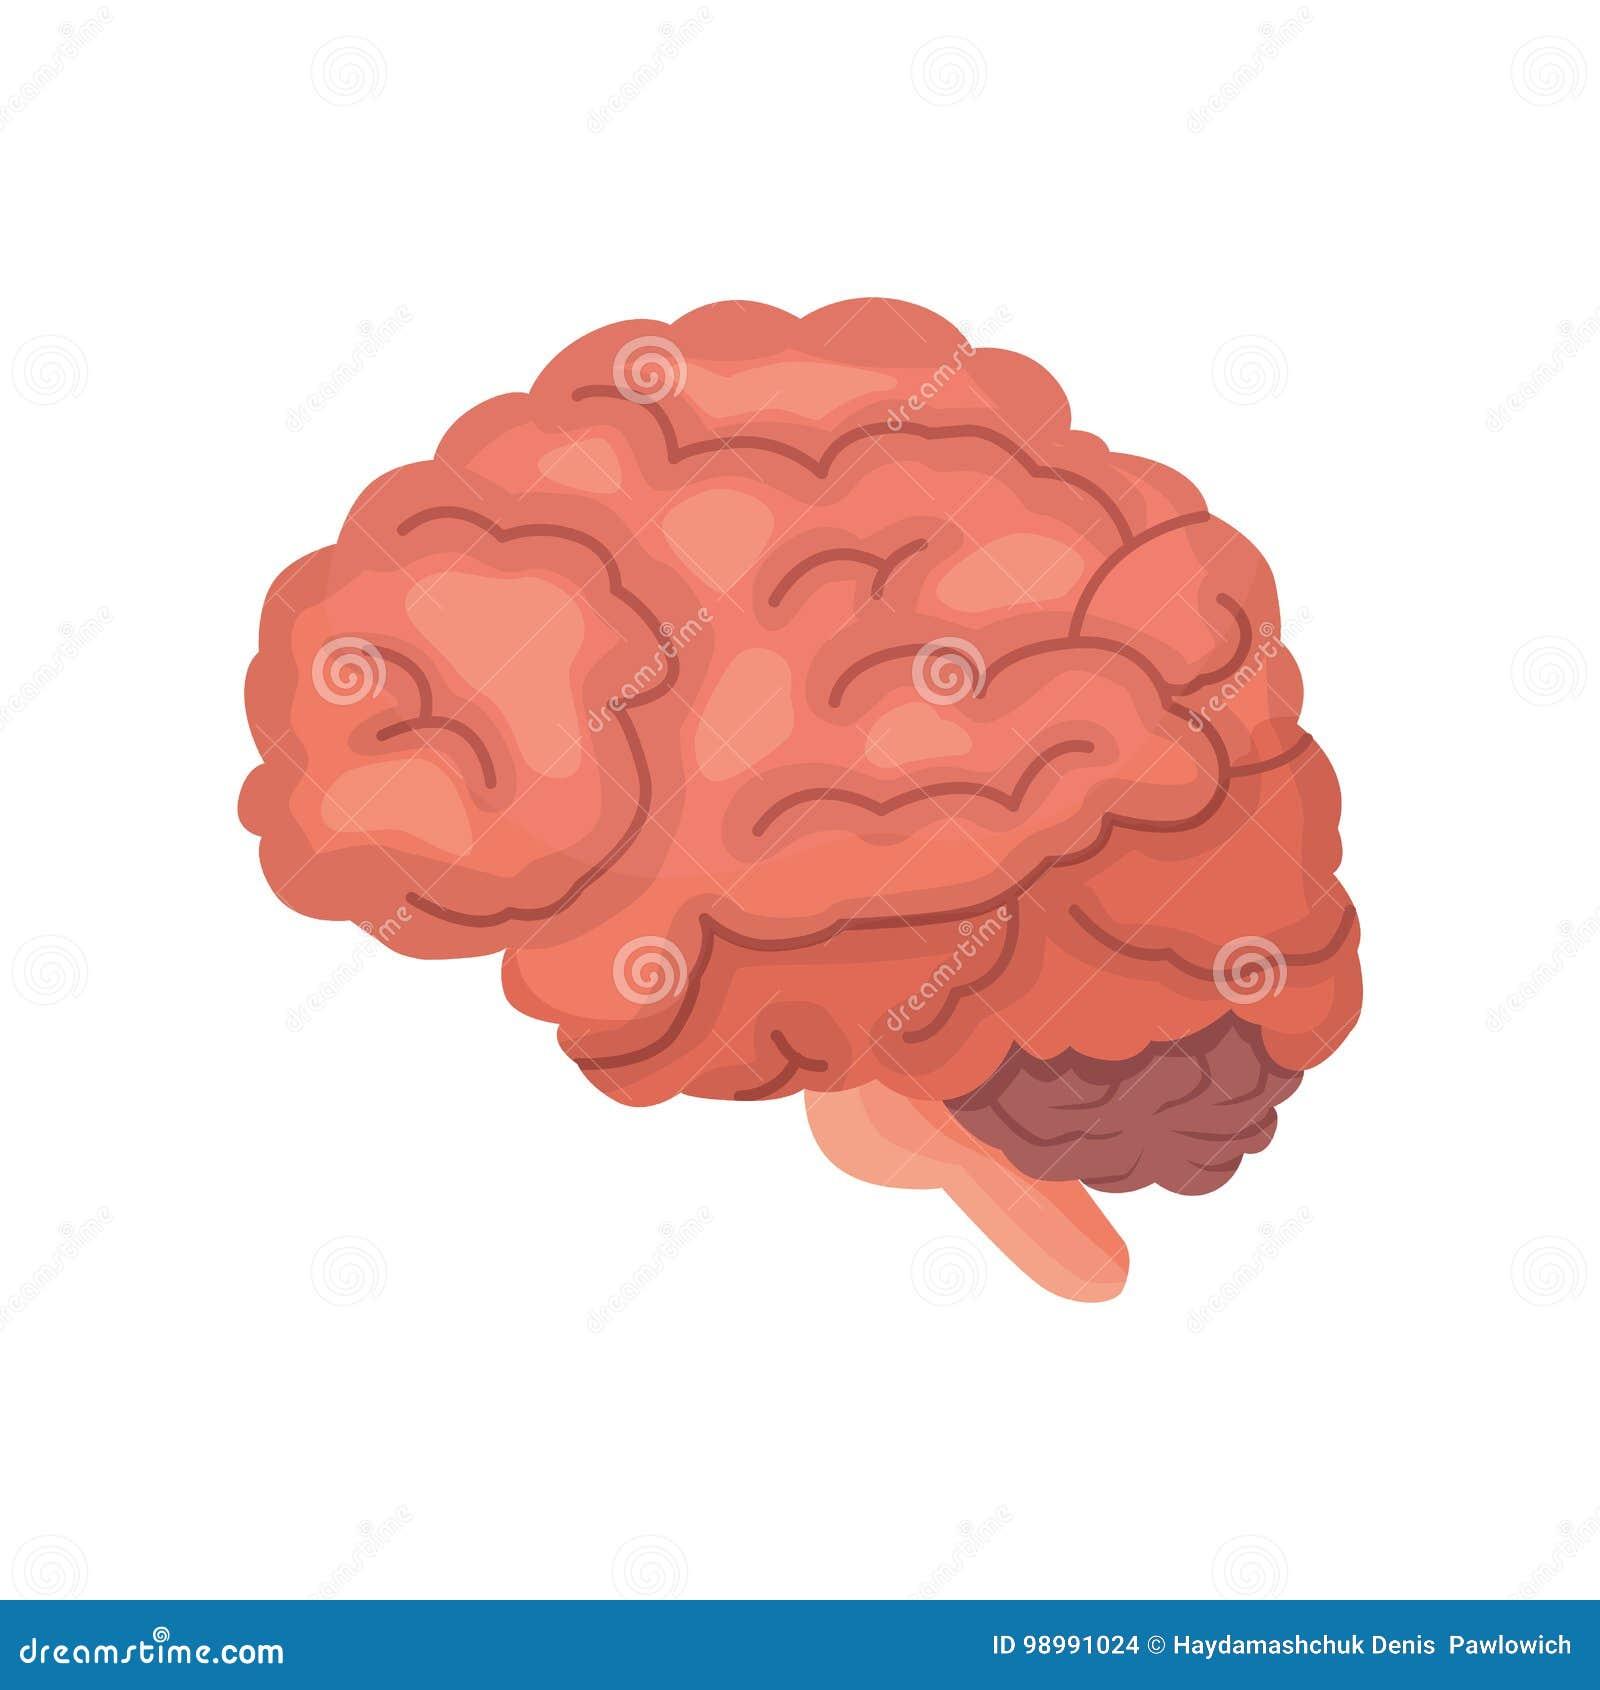 Human Brain Anatomy Cartoon Vector Icon Isolated Stock Vector